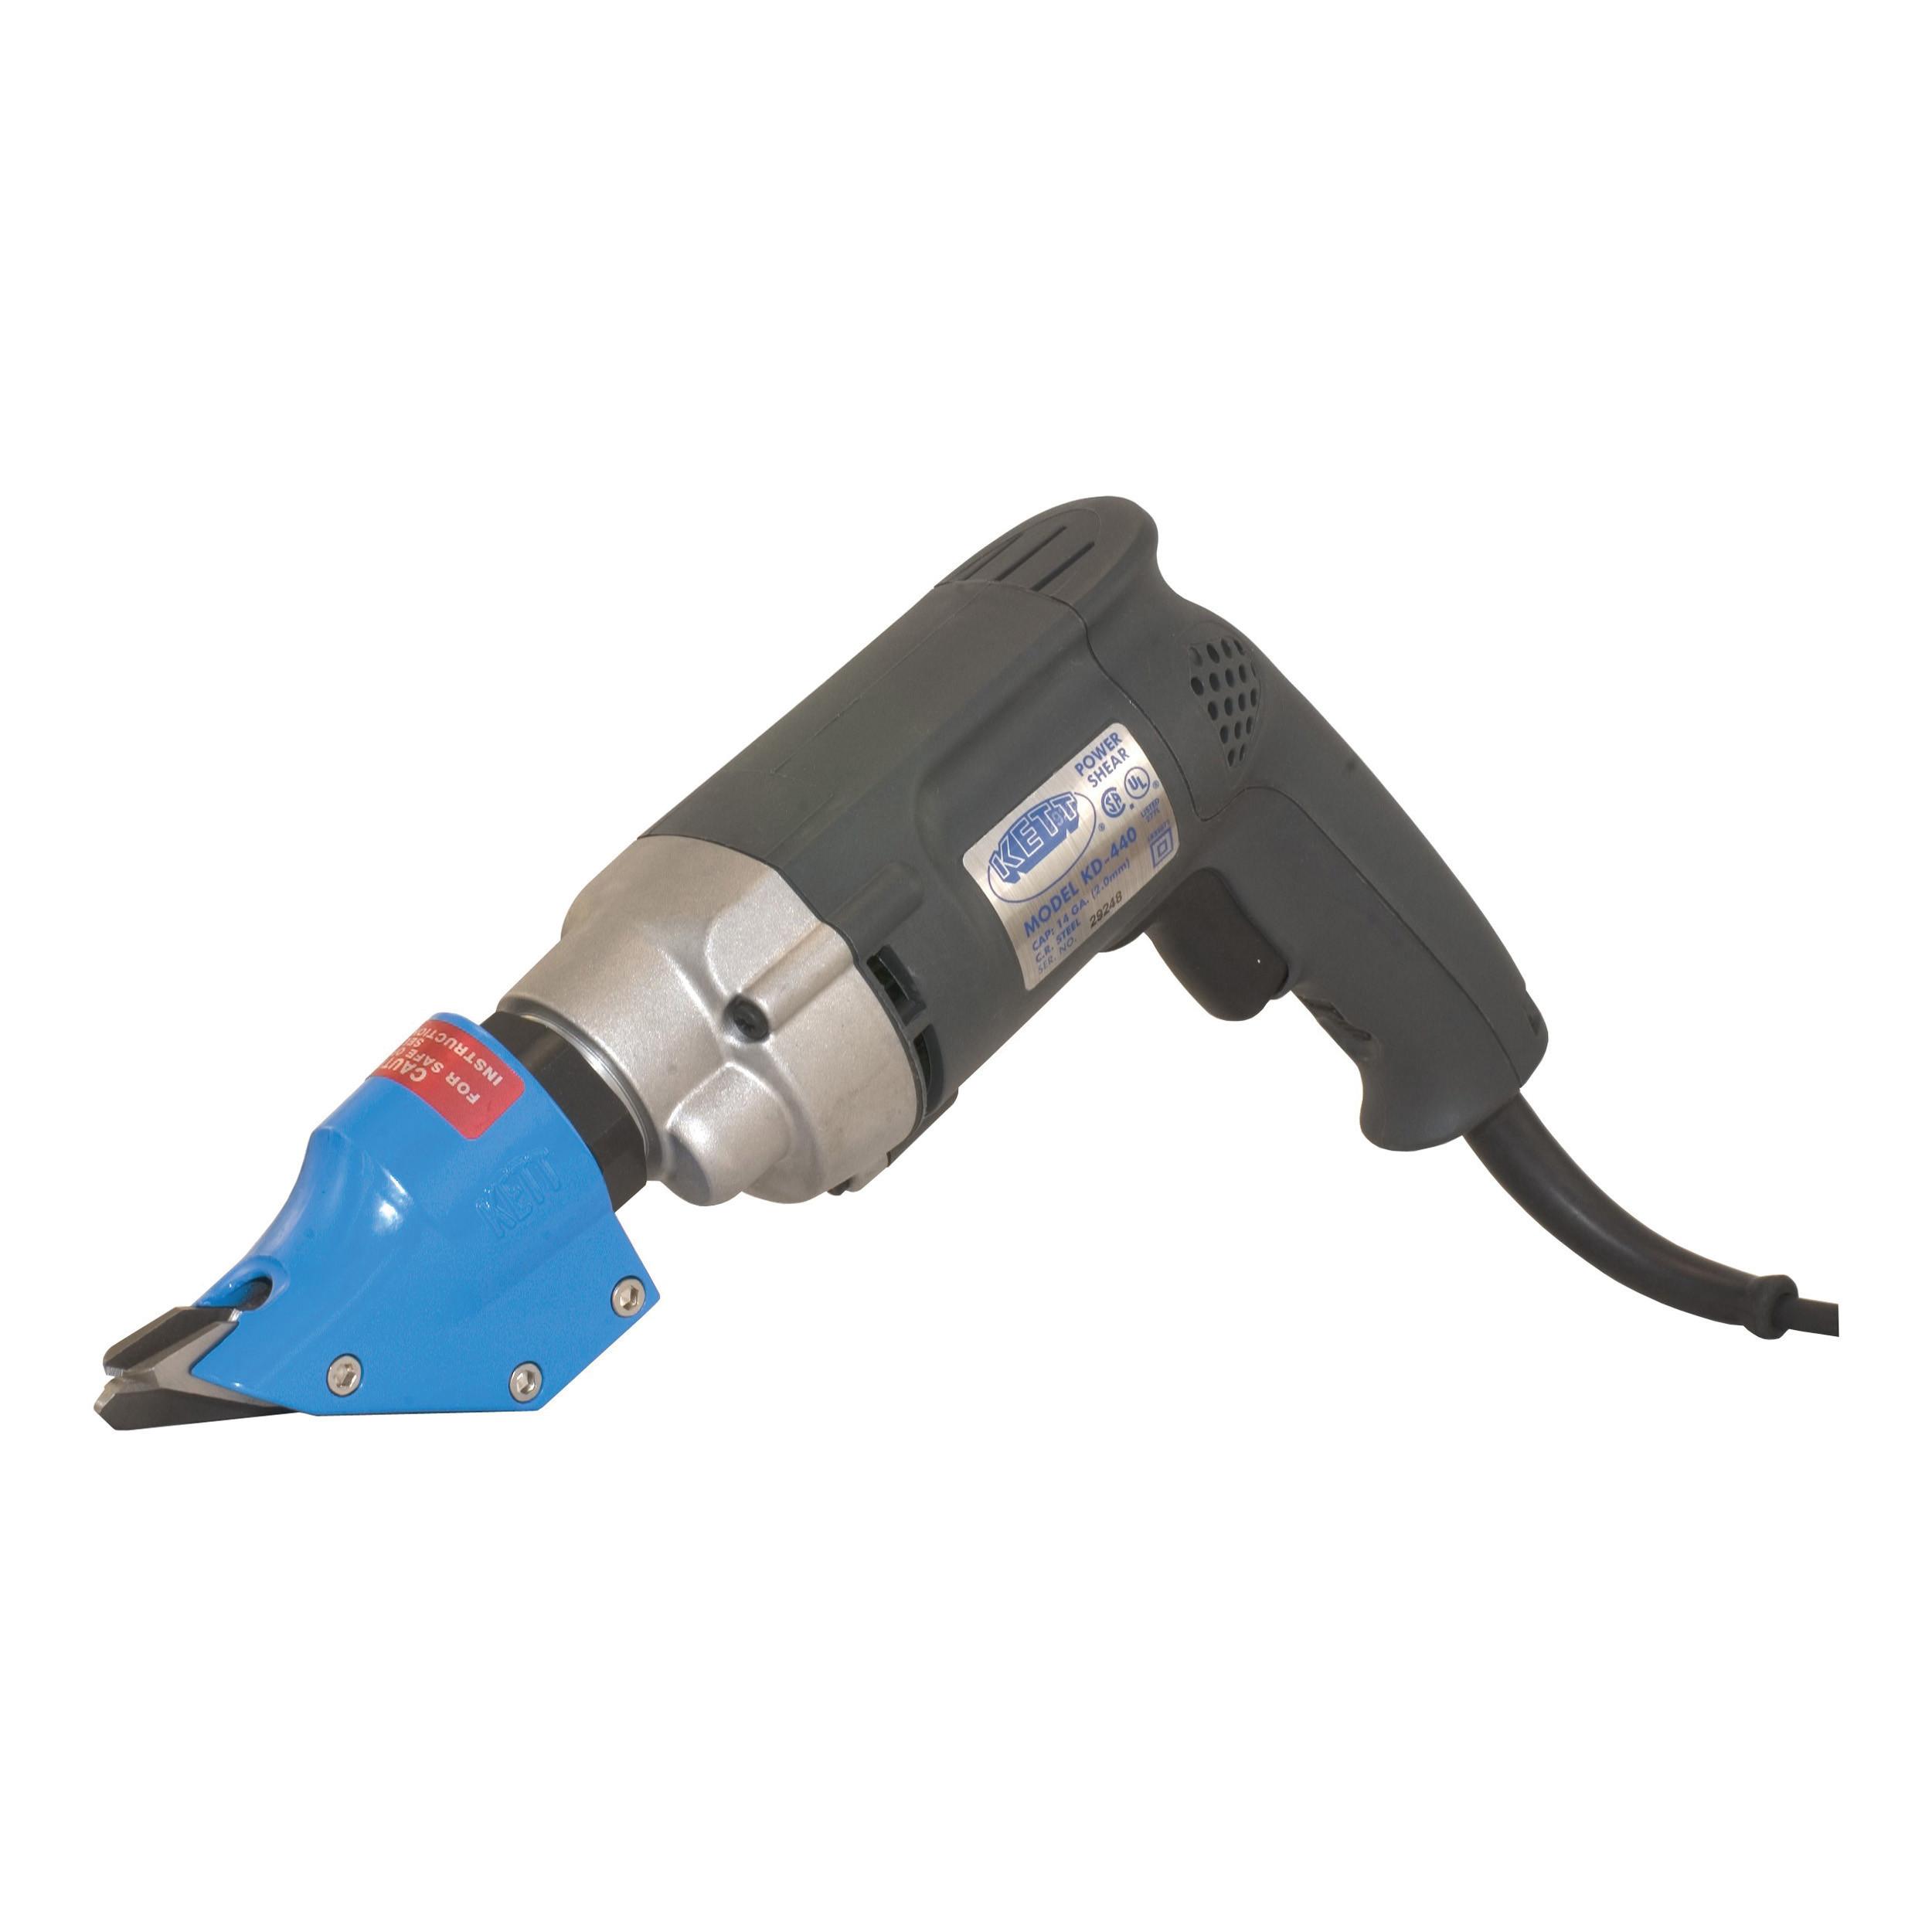 KETT Double Cut 120 V Electric Shear